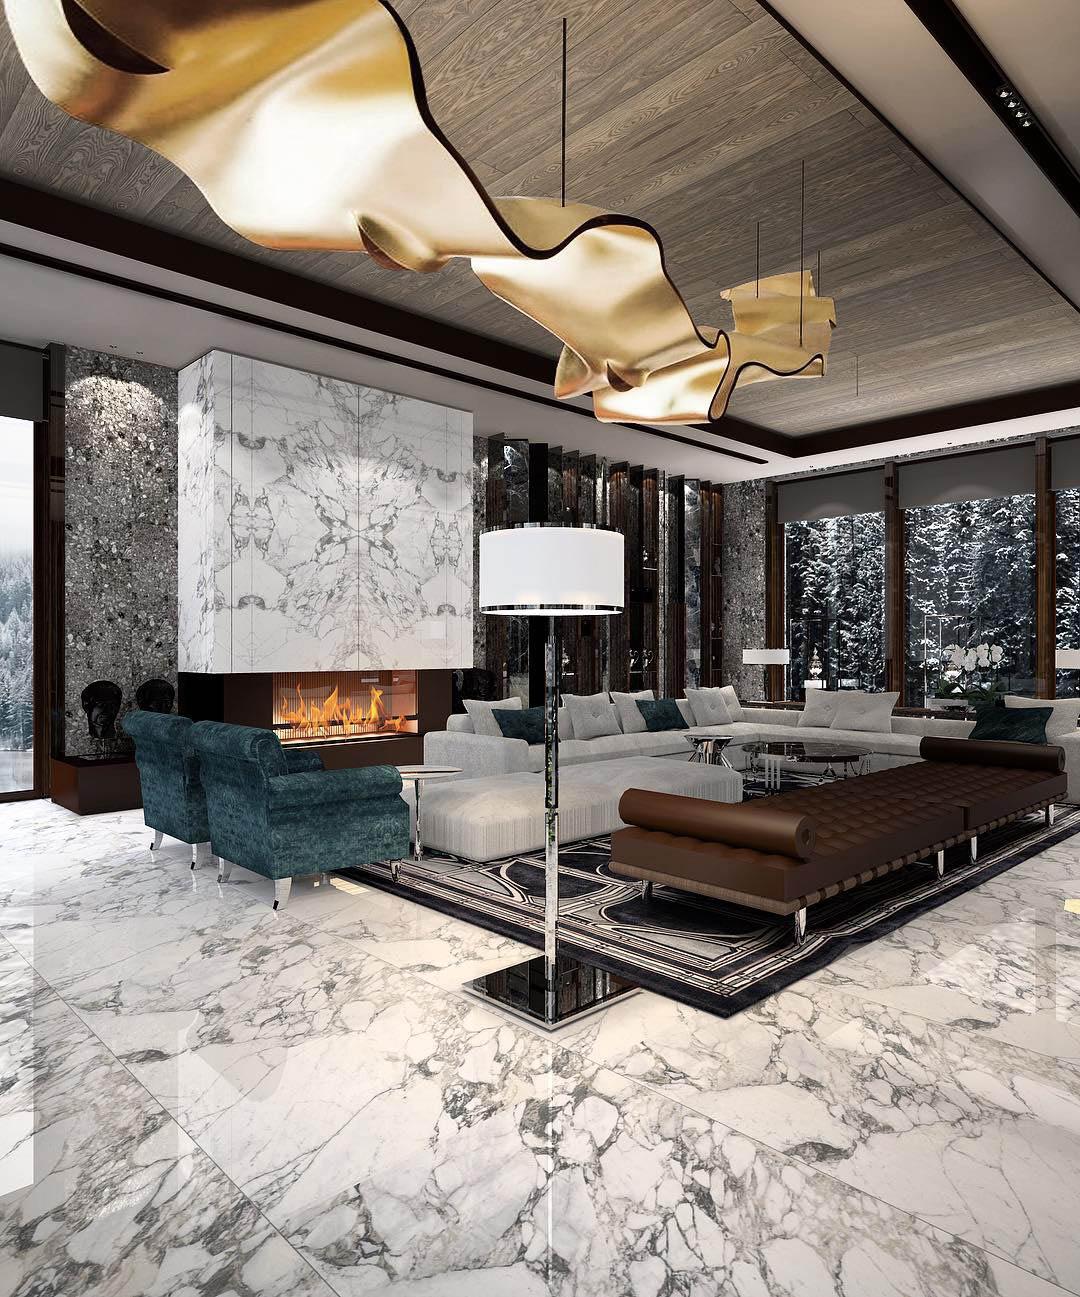 Constantin Frolov Interior Design | Glamorous Interior Design